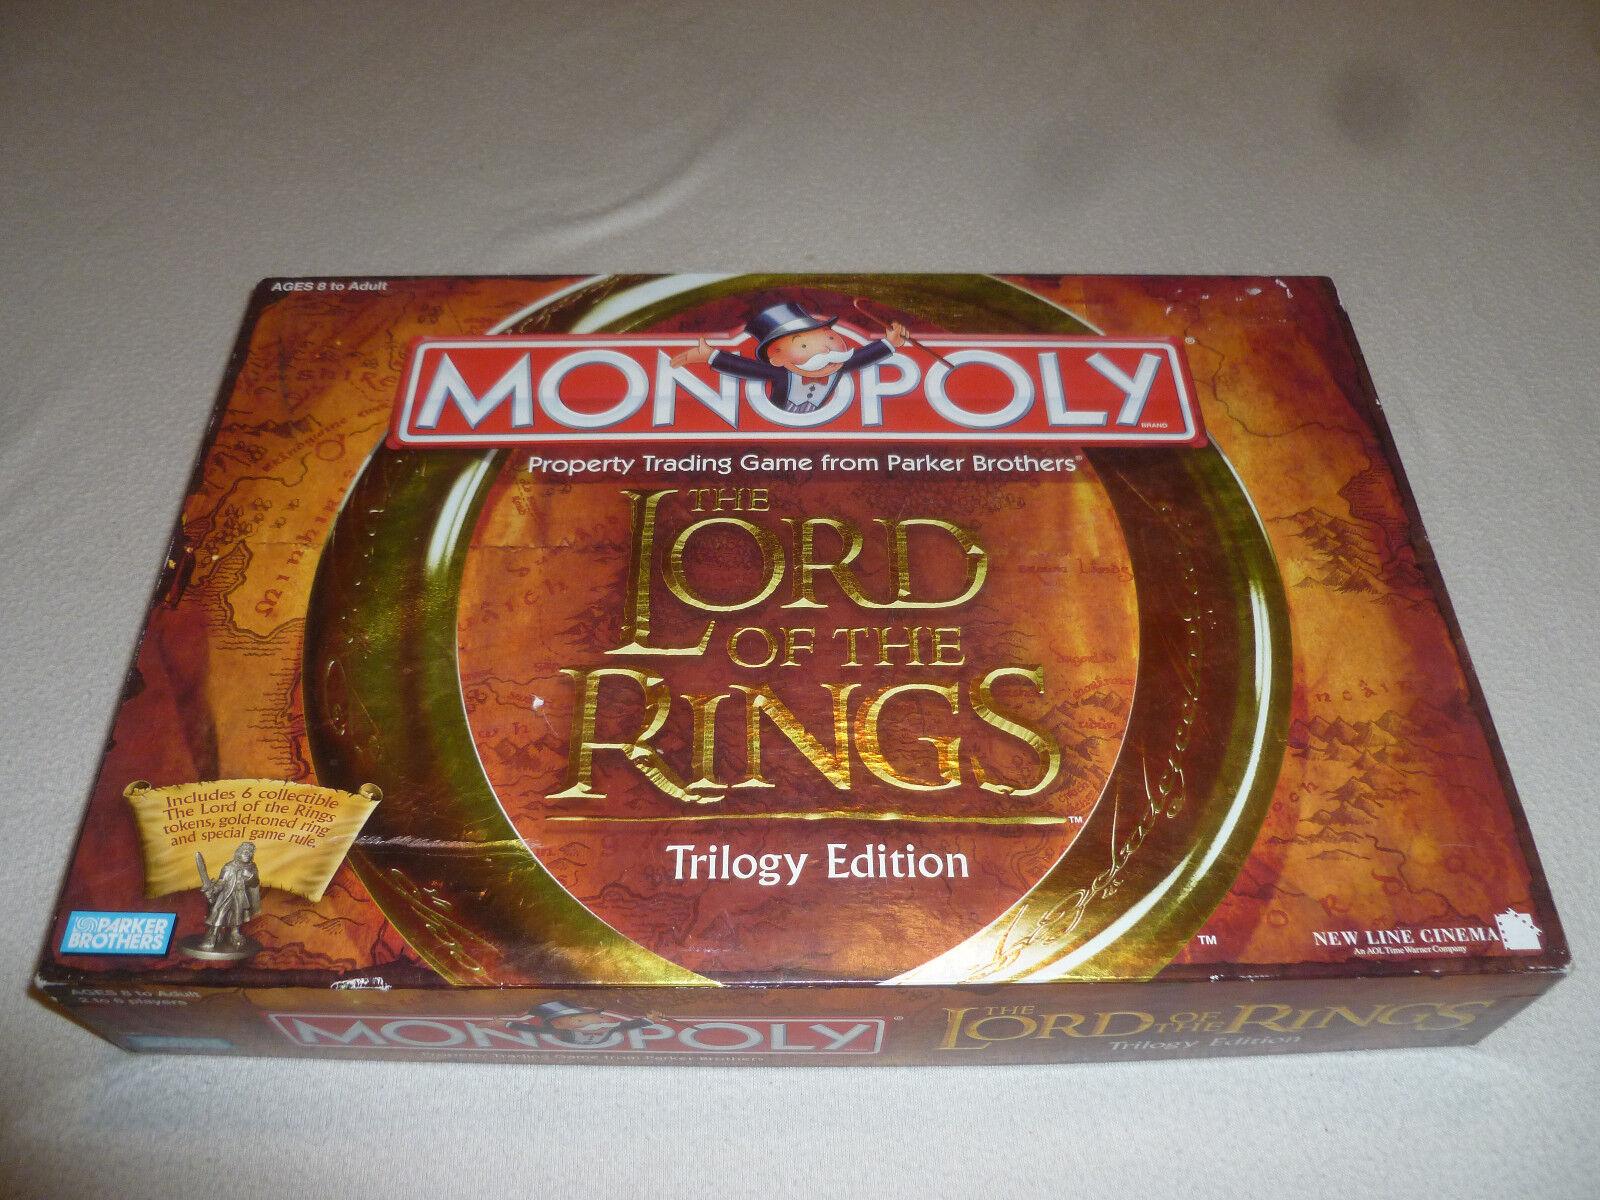 Box - monopol  der herr der ringe  - trilogie ausgabe 2003 parker brothers spiel